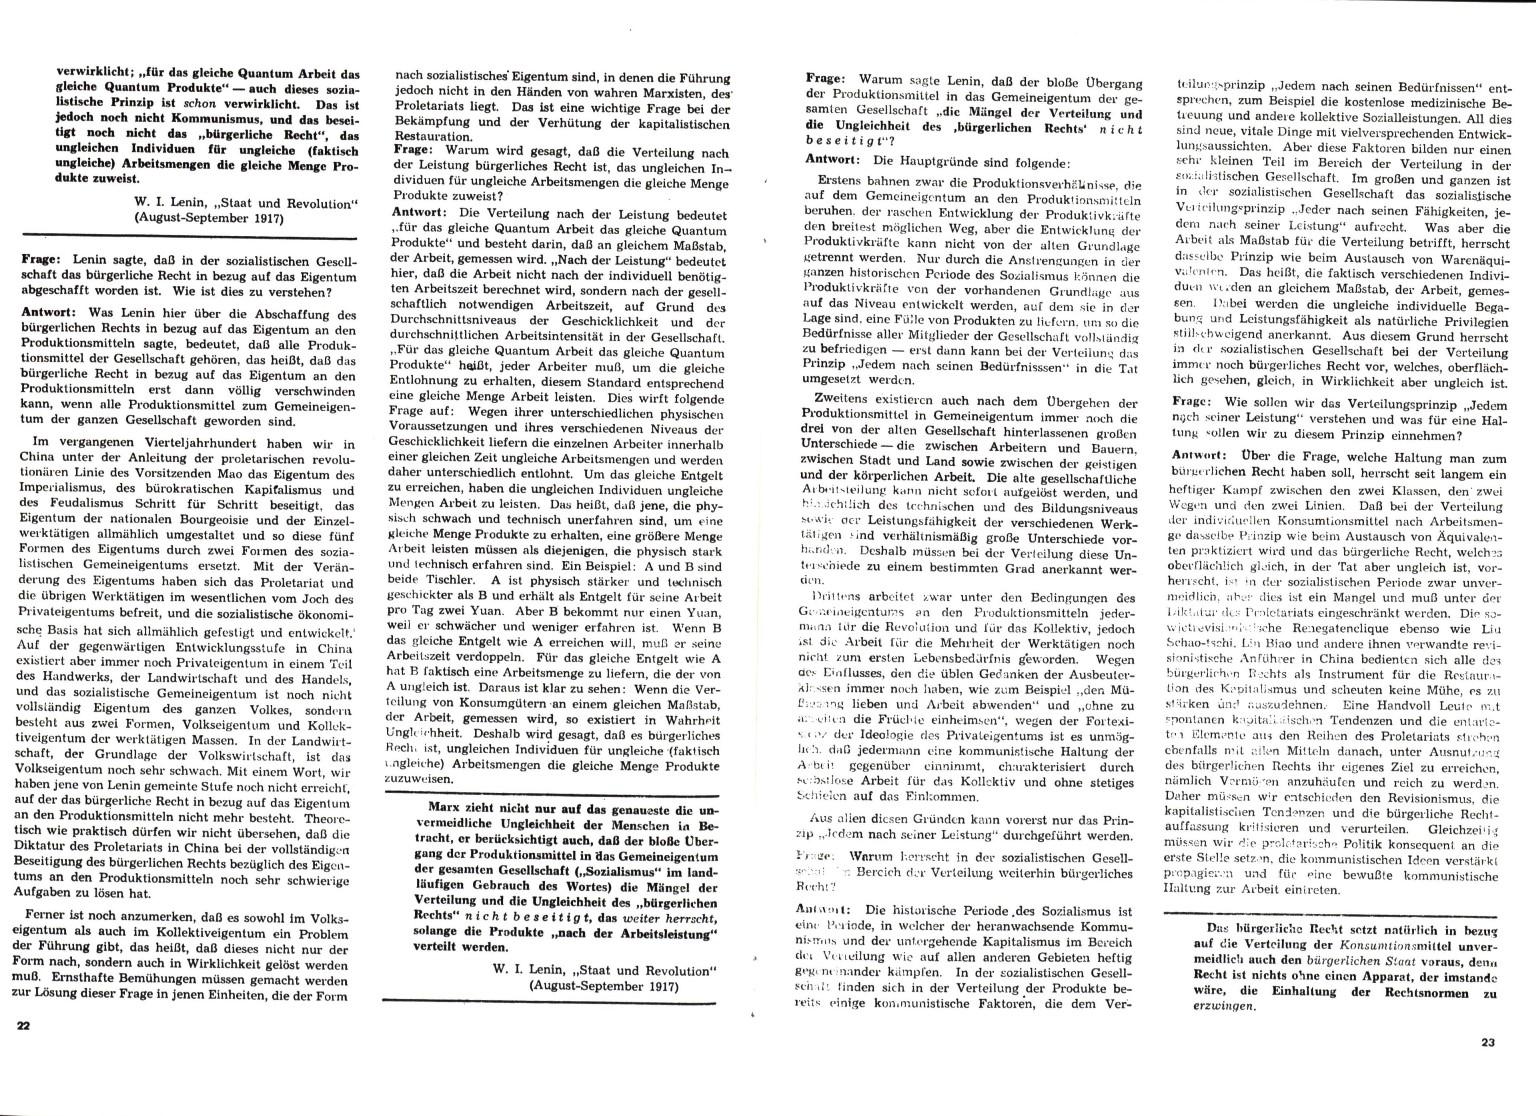 KPDAO_1976_Es_lebe_die_Diktatur_des_Proletariats_14